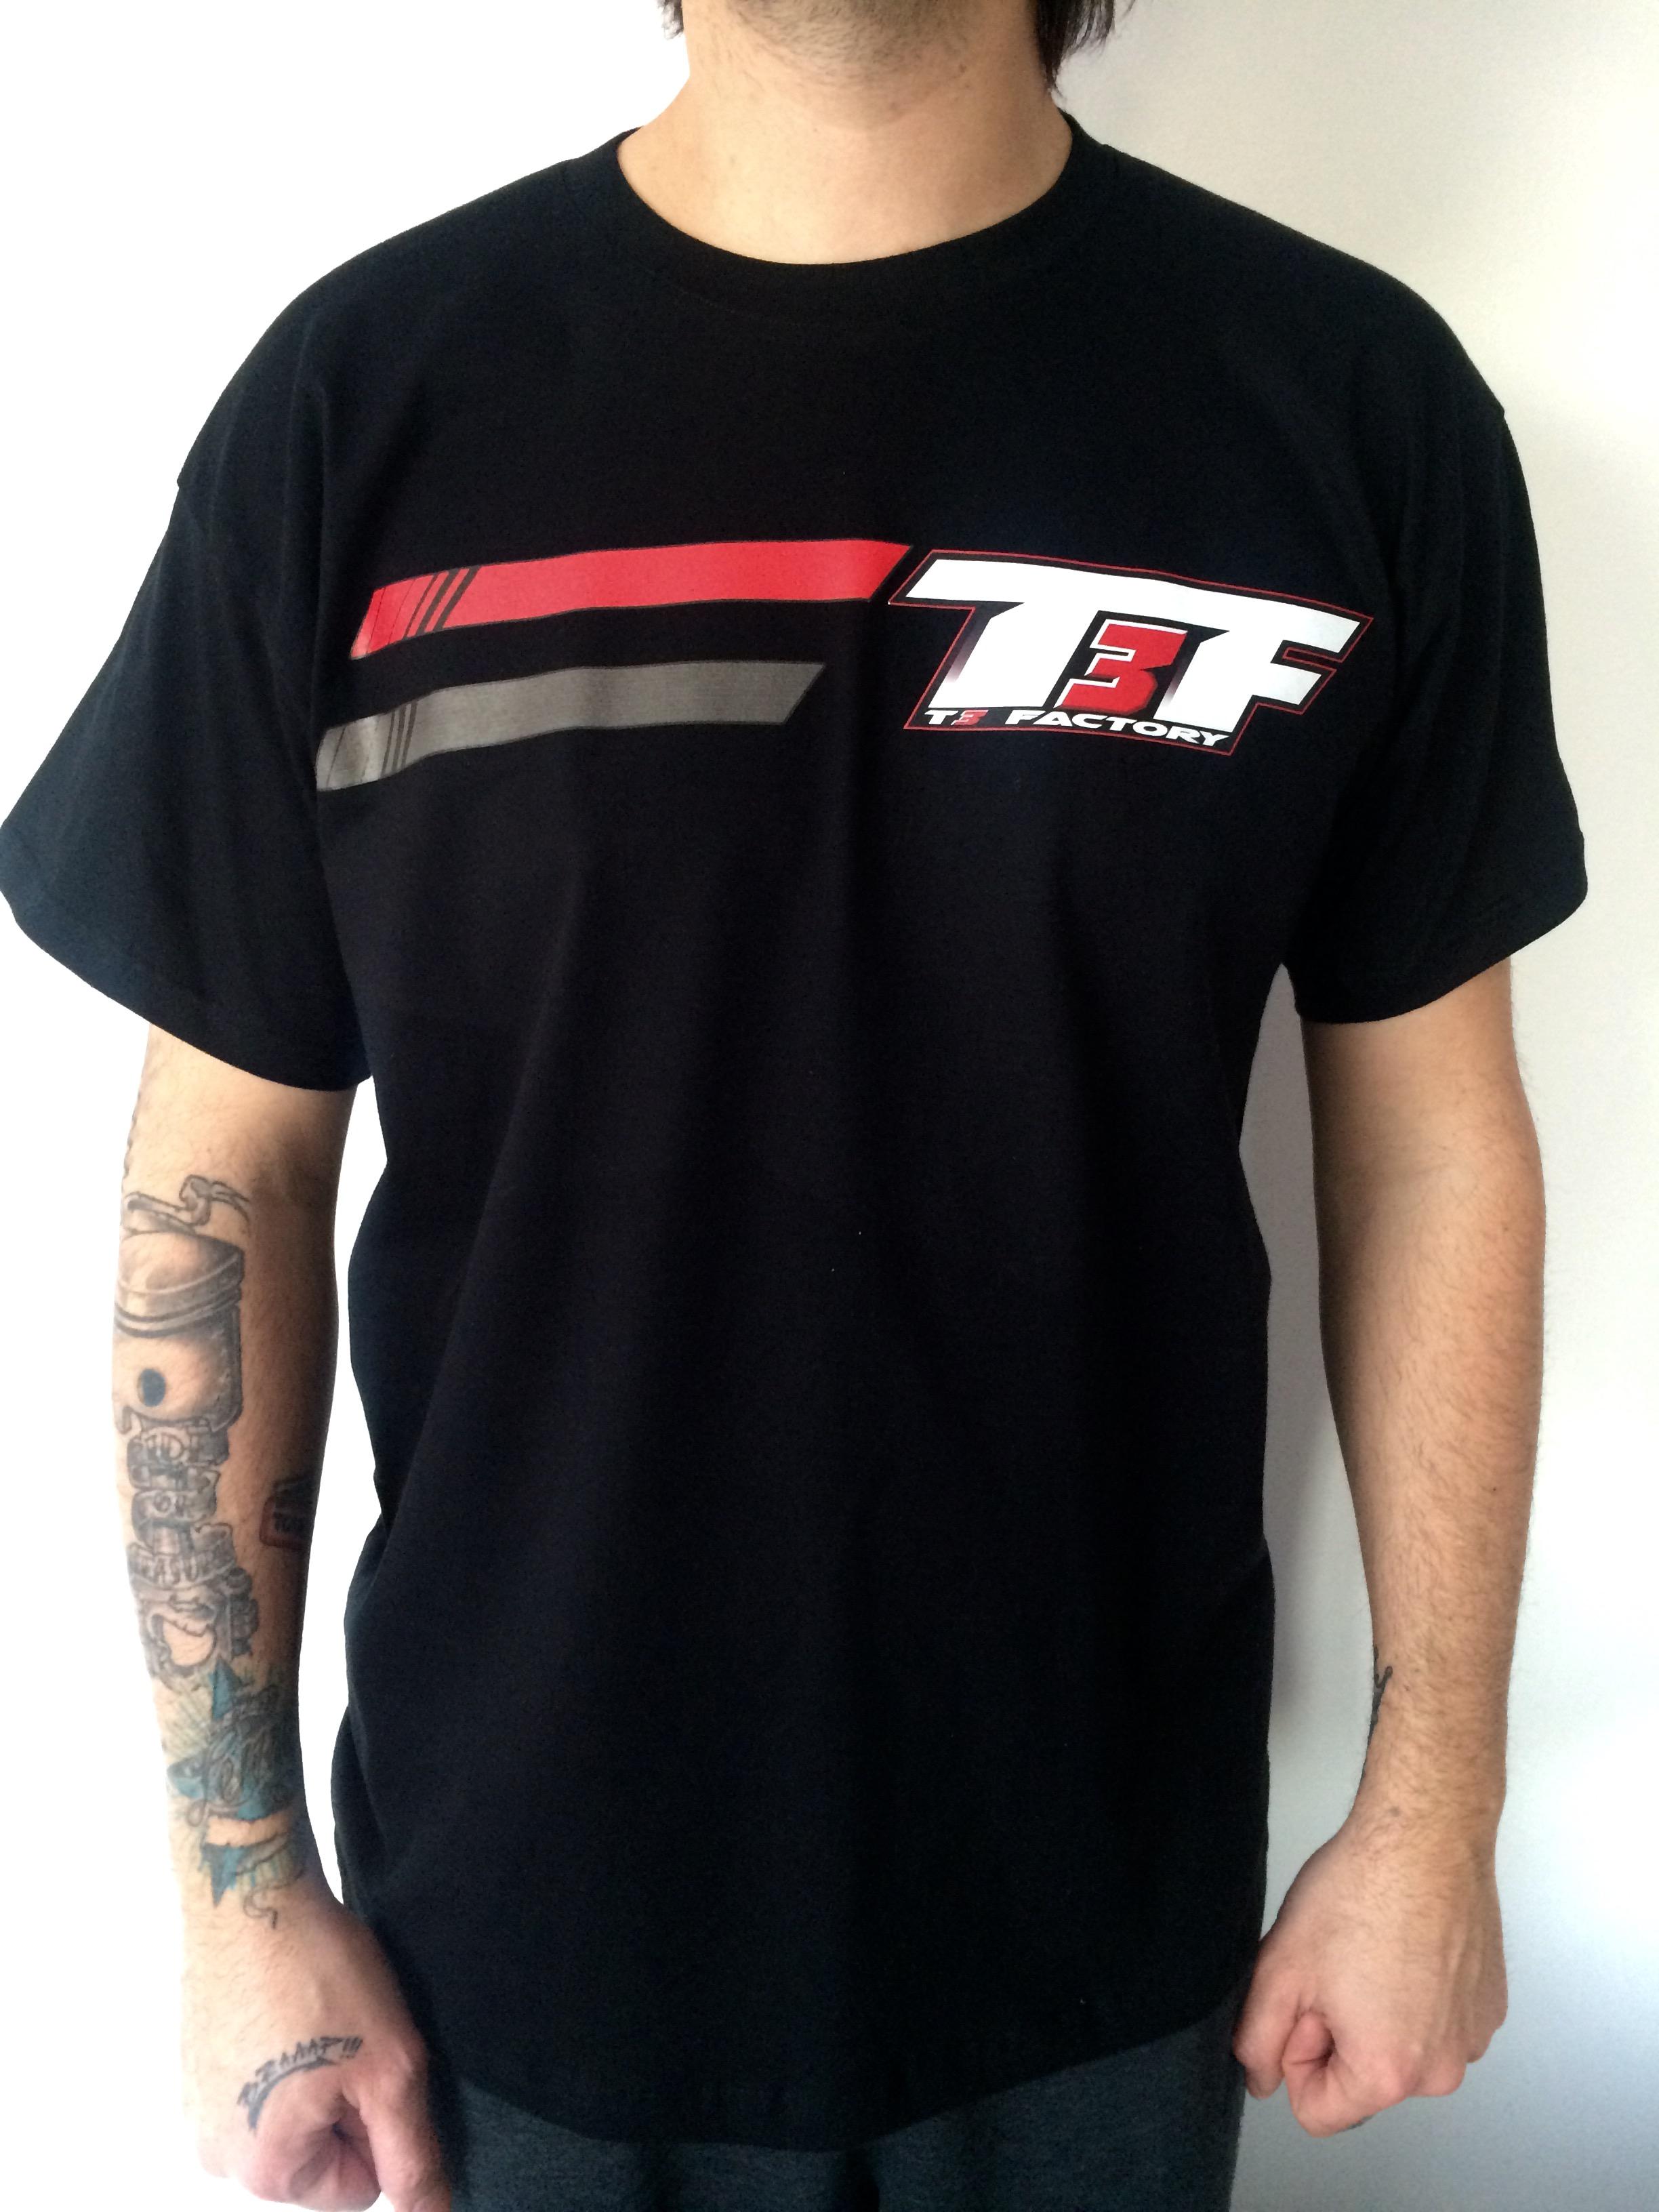 Tee-shirt personnalisé T3F